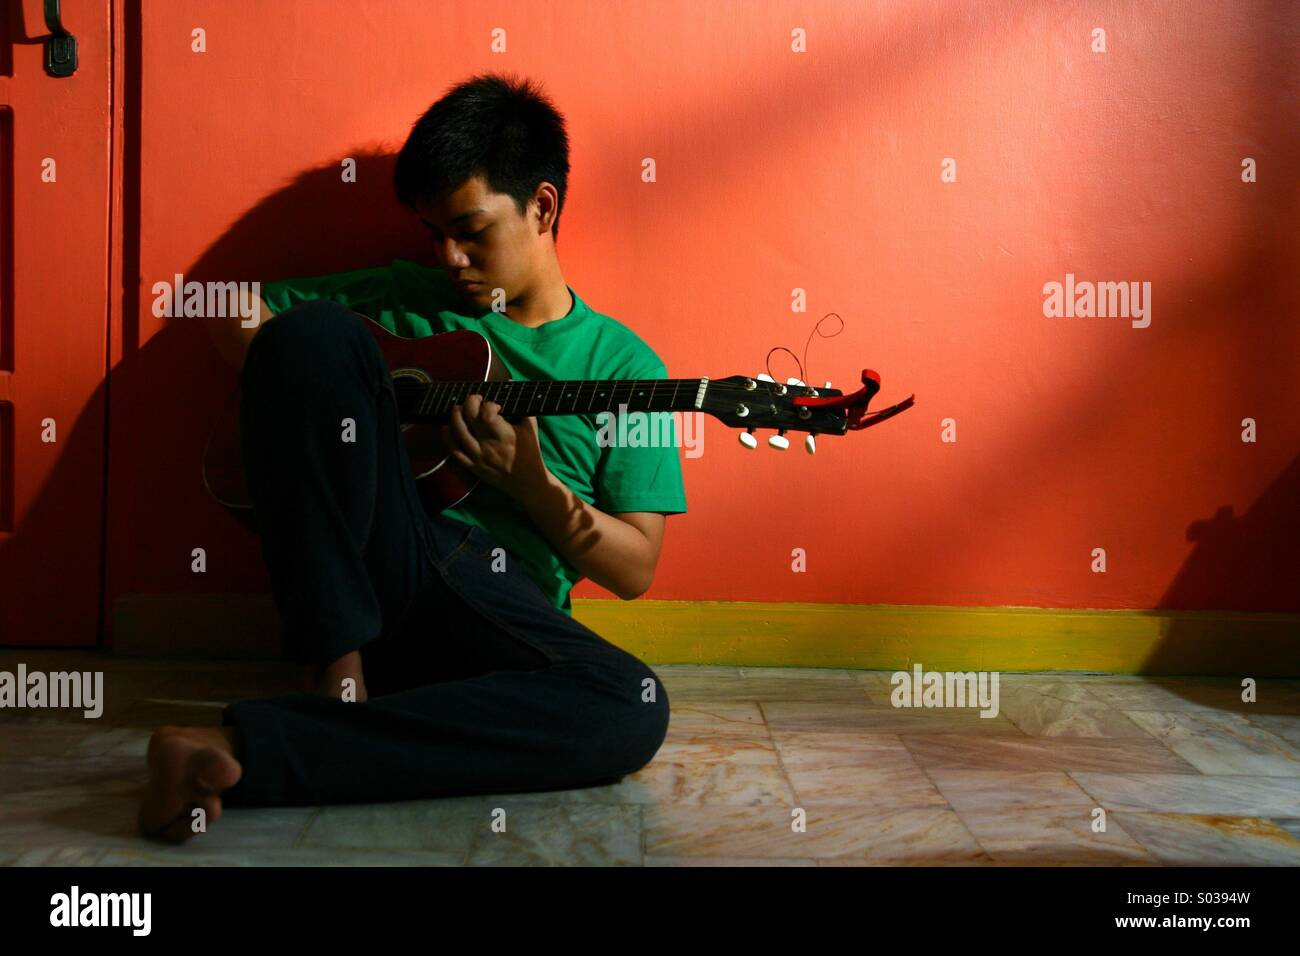 Young asian teen tocando la guitarra en una sala vacía Imagen De Stock